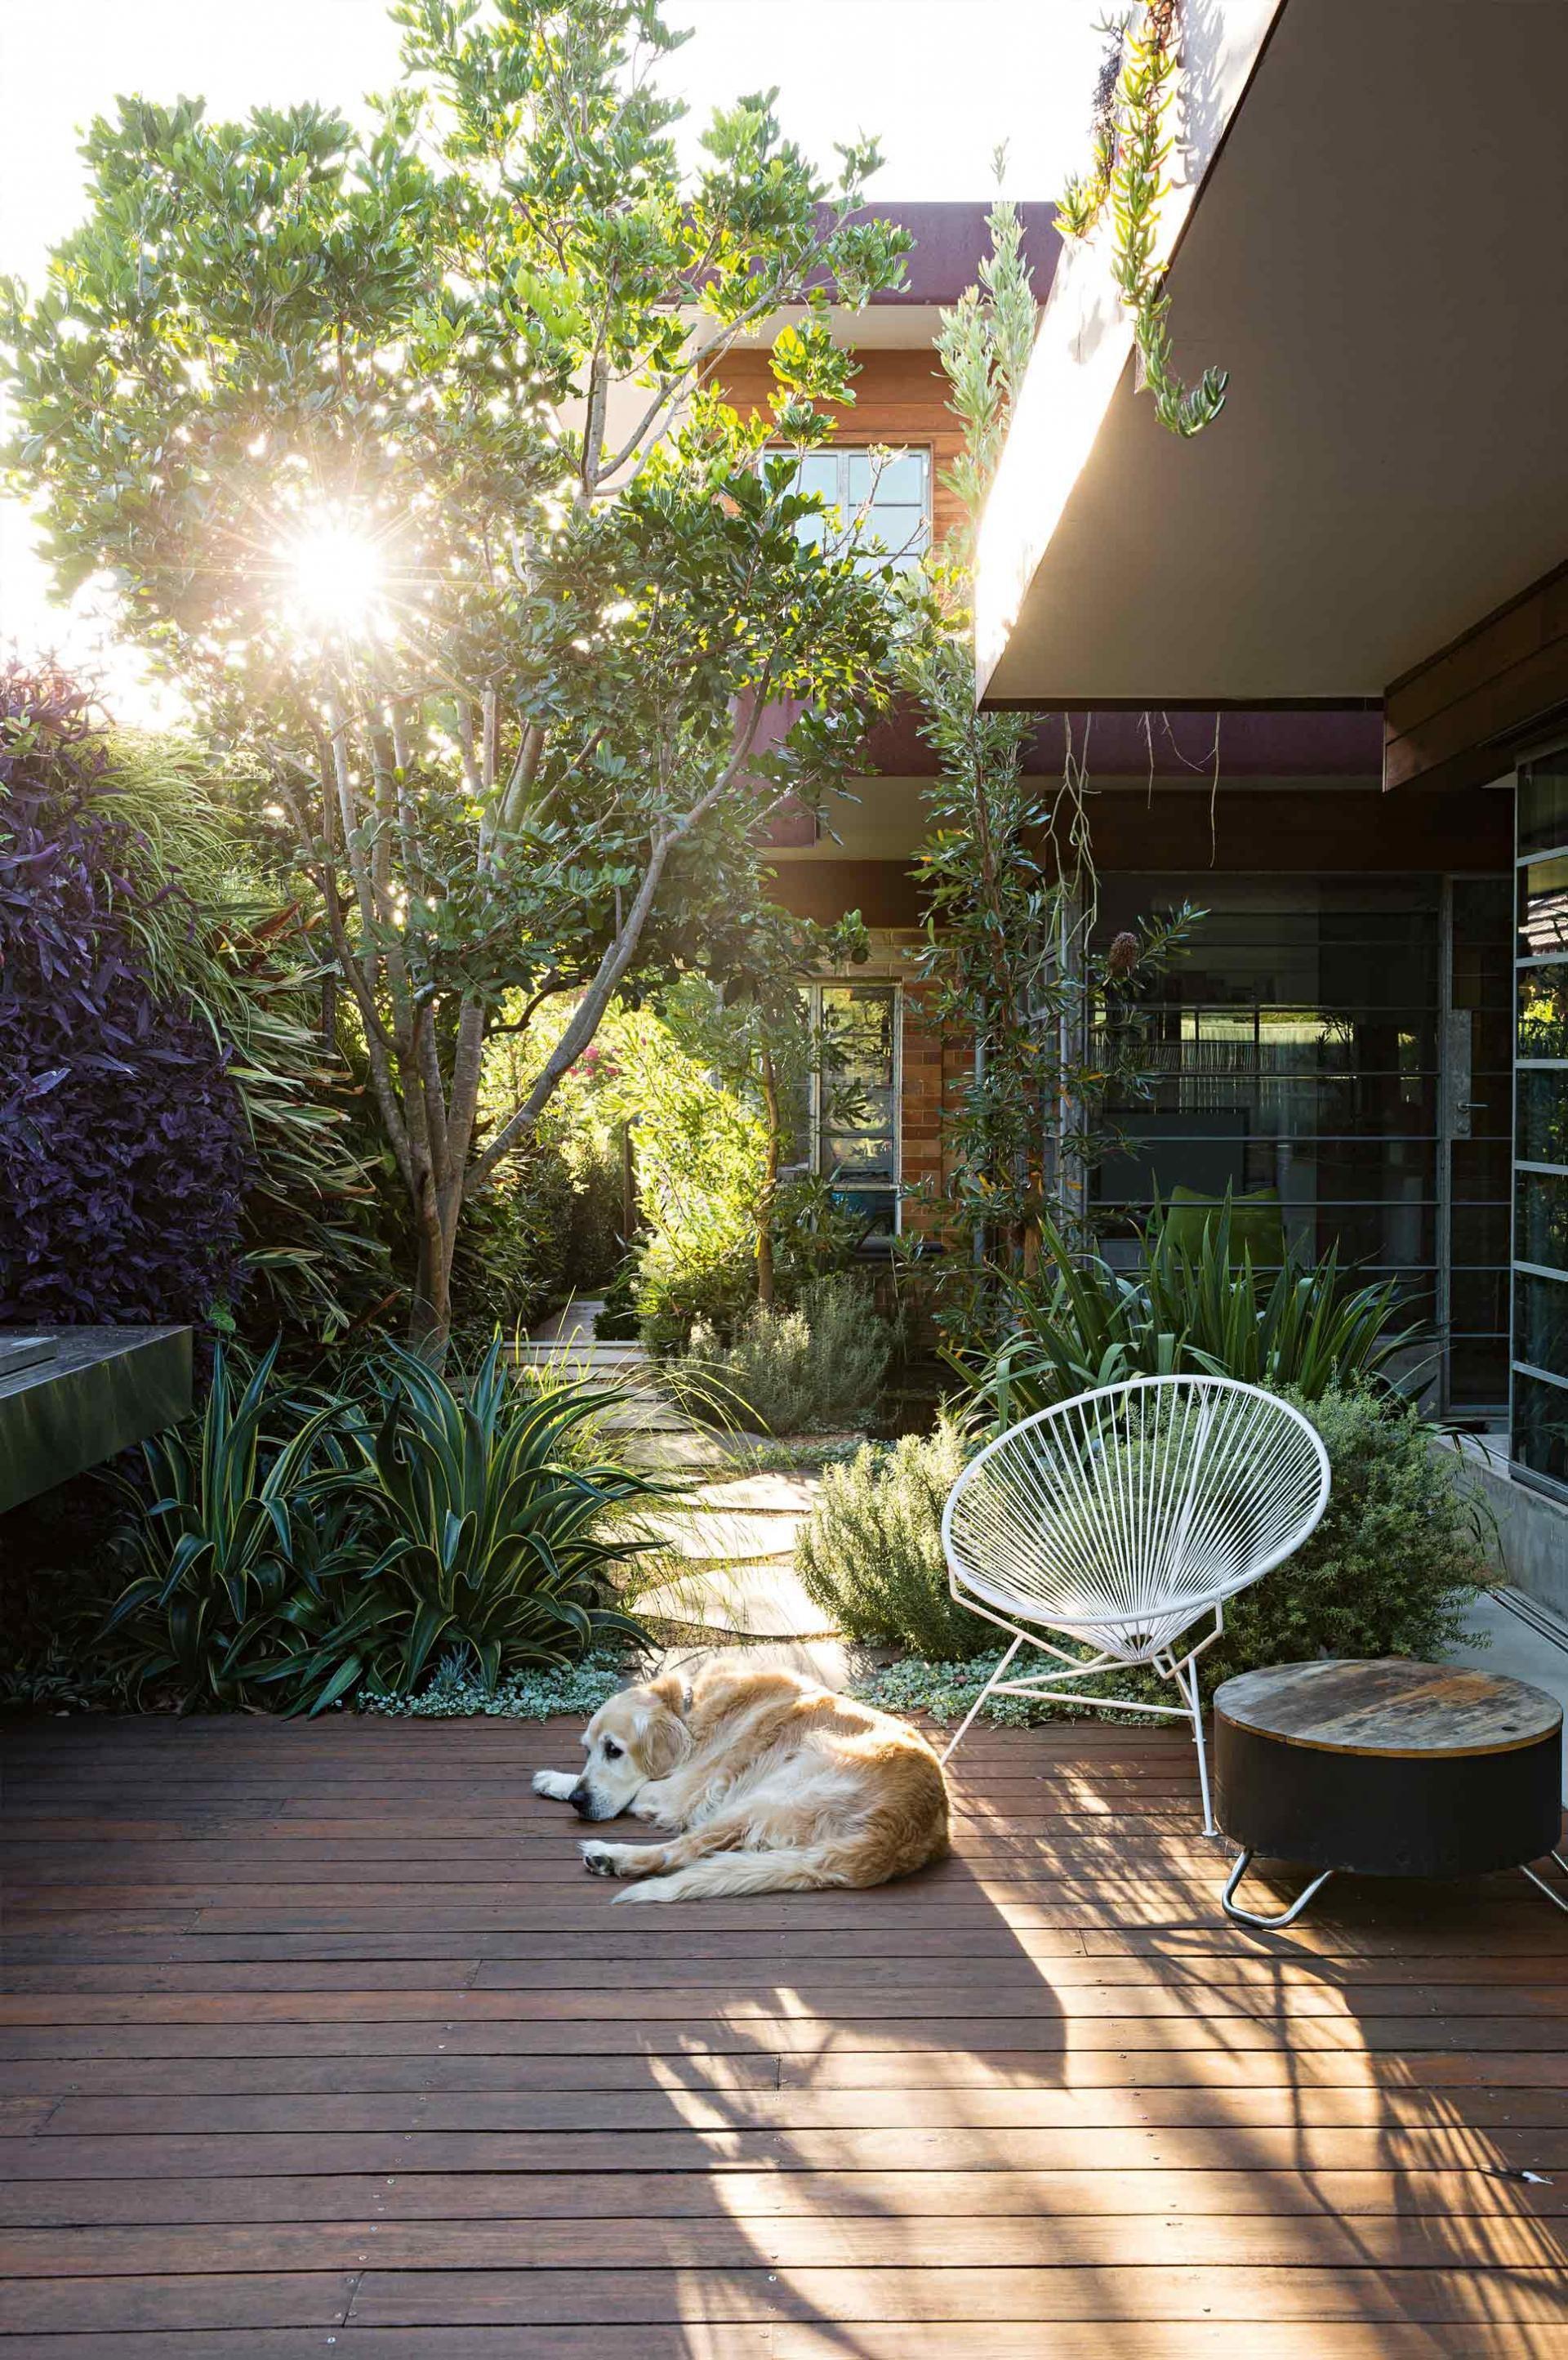 Deck dog courtyard garden peter fudge july15 garden for Courtyard landscaping